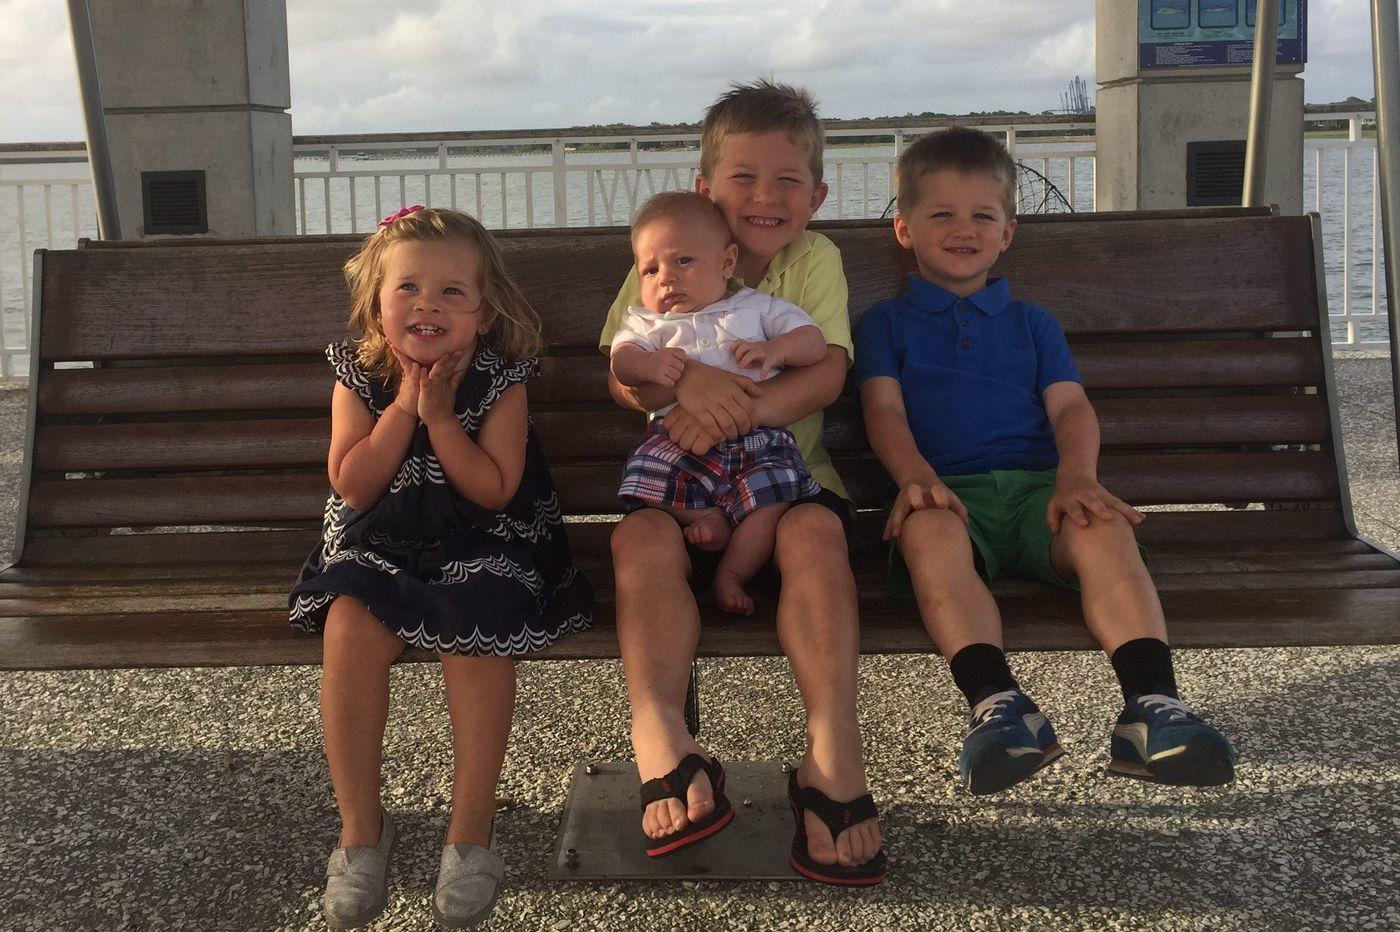 The Parent Trip: Lisa and Bill Zane of Fishtown